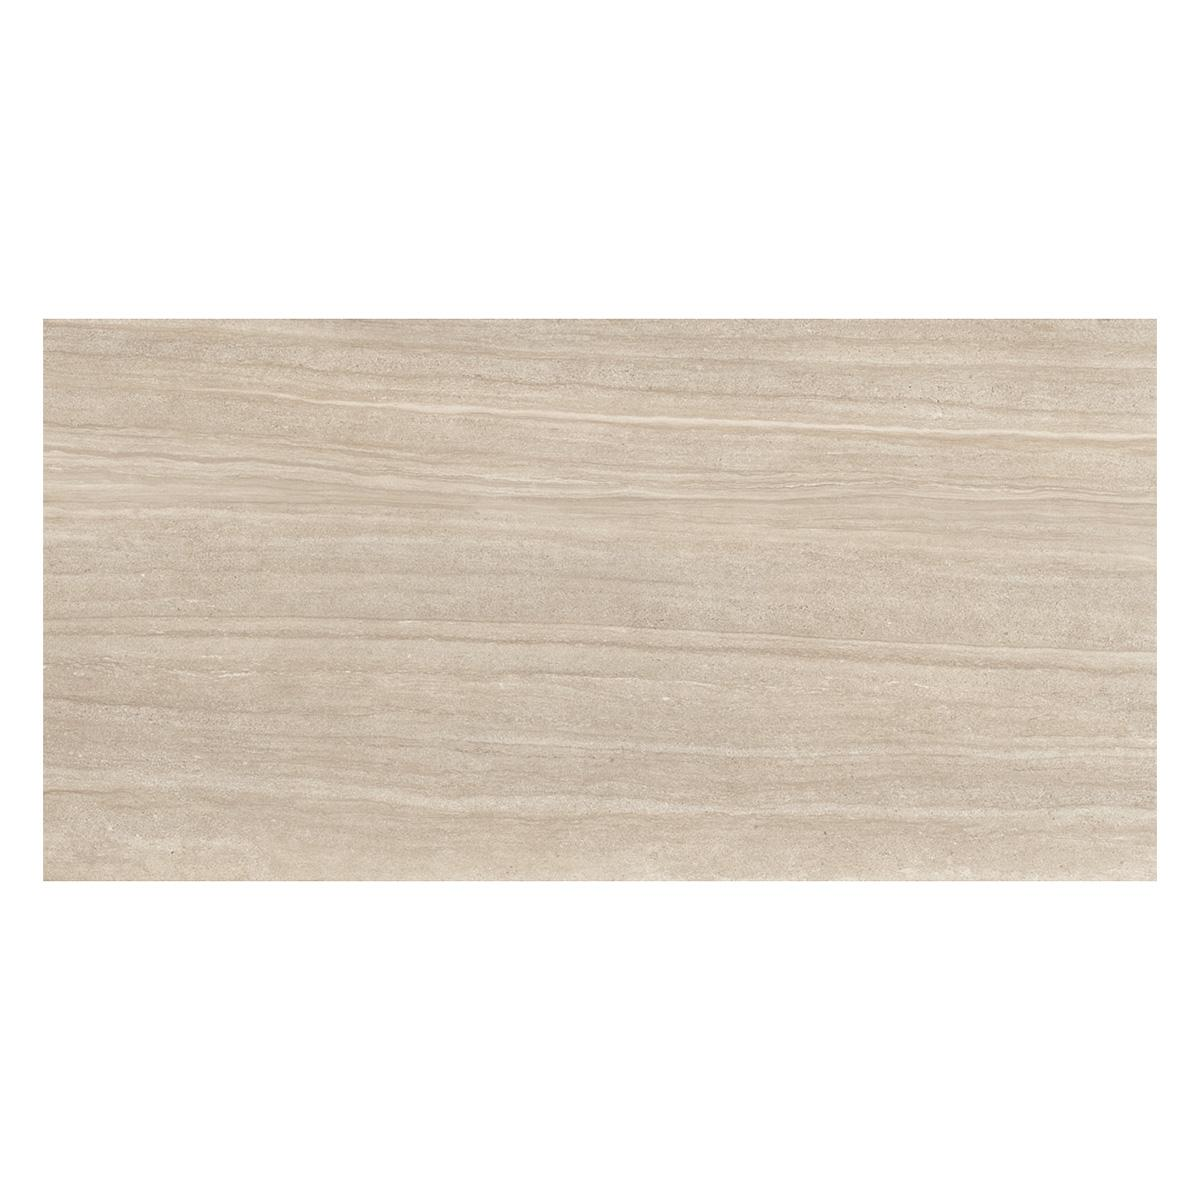 Porcelanato Stone Project Sand Rectificado - 60X120 cm - 1.44 m2